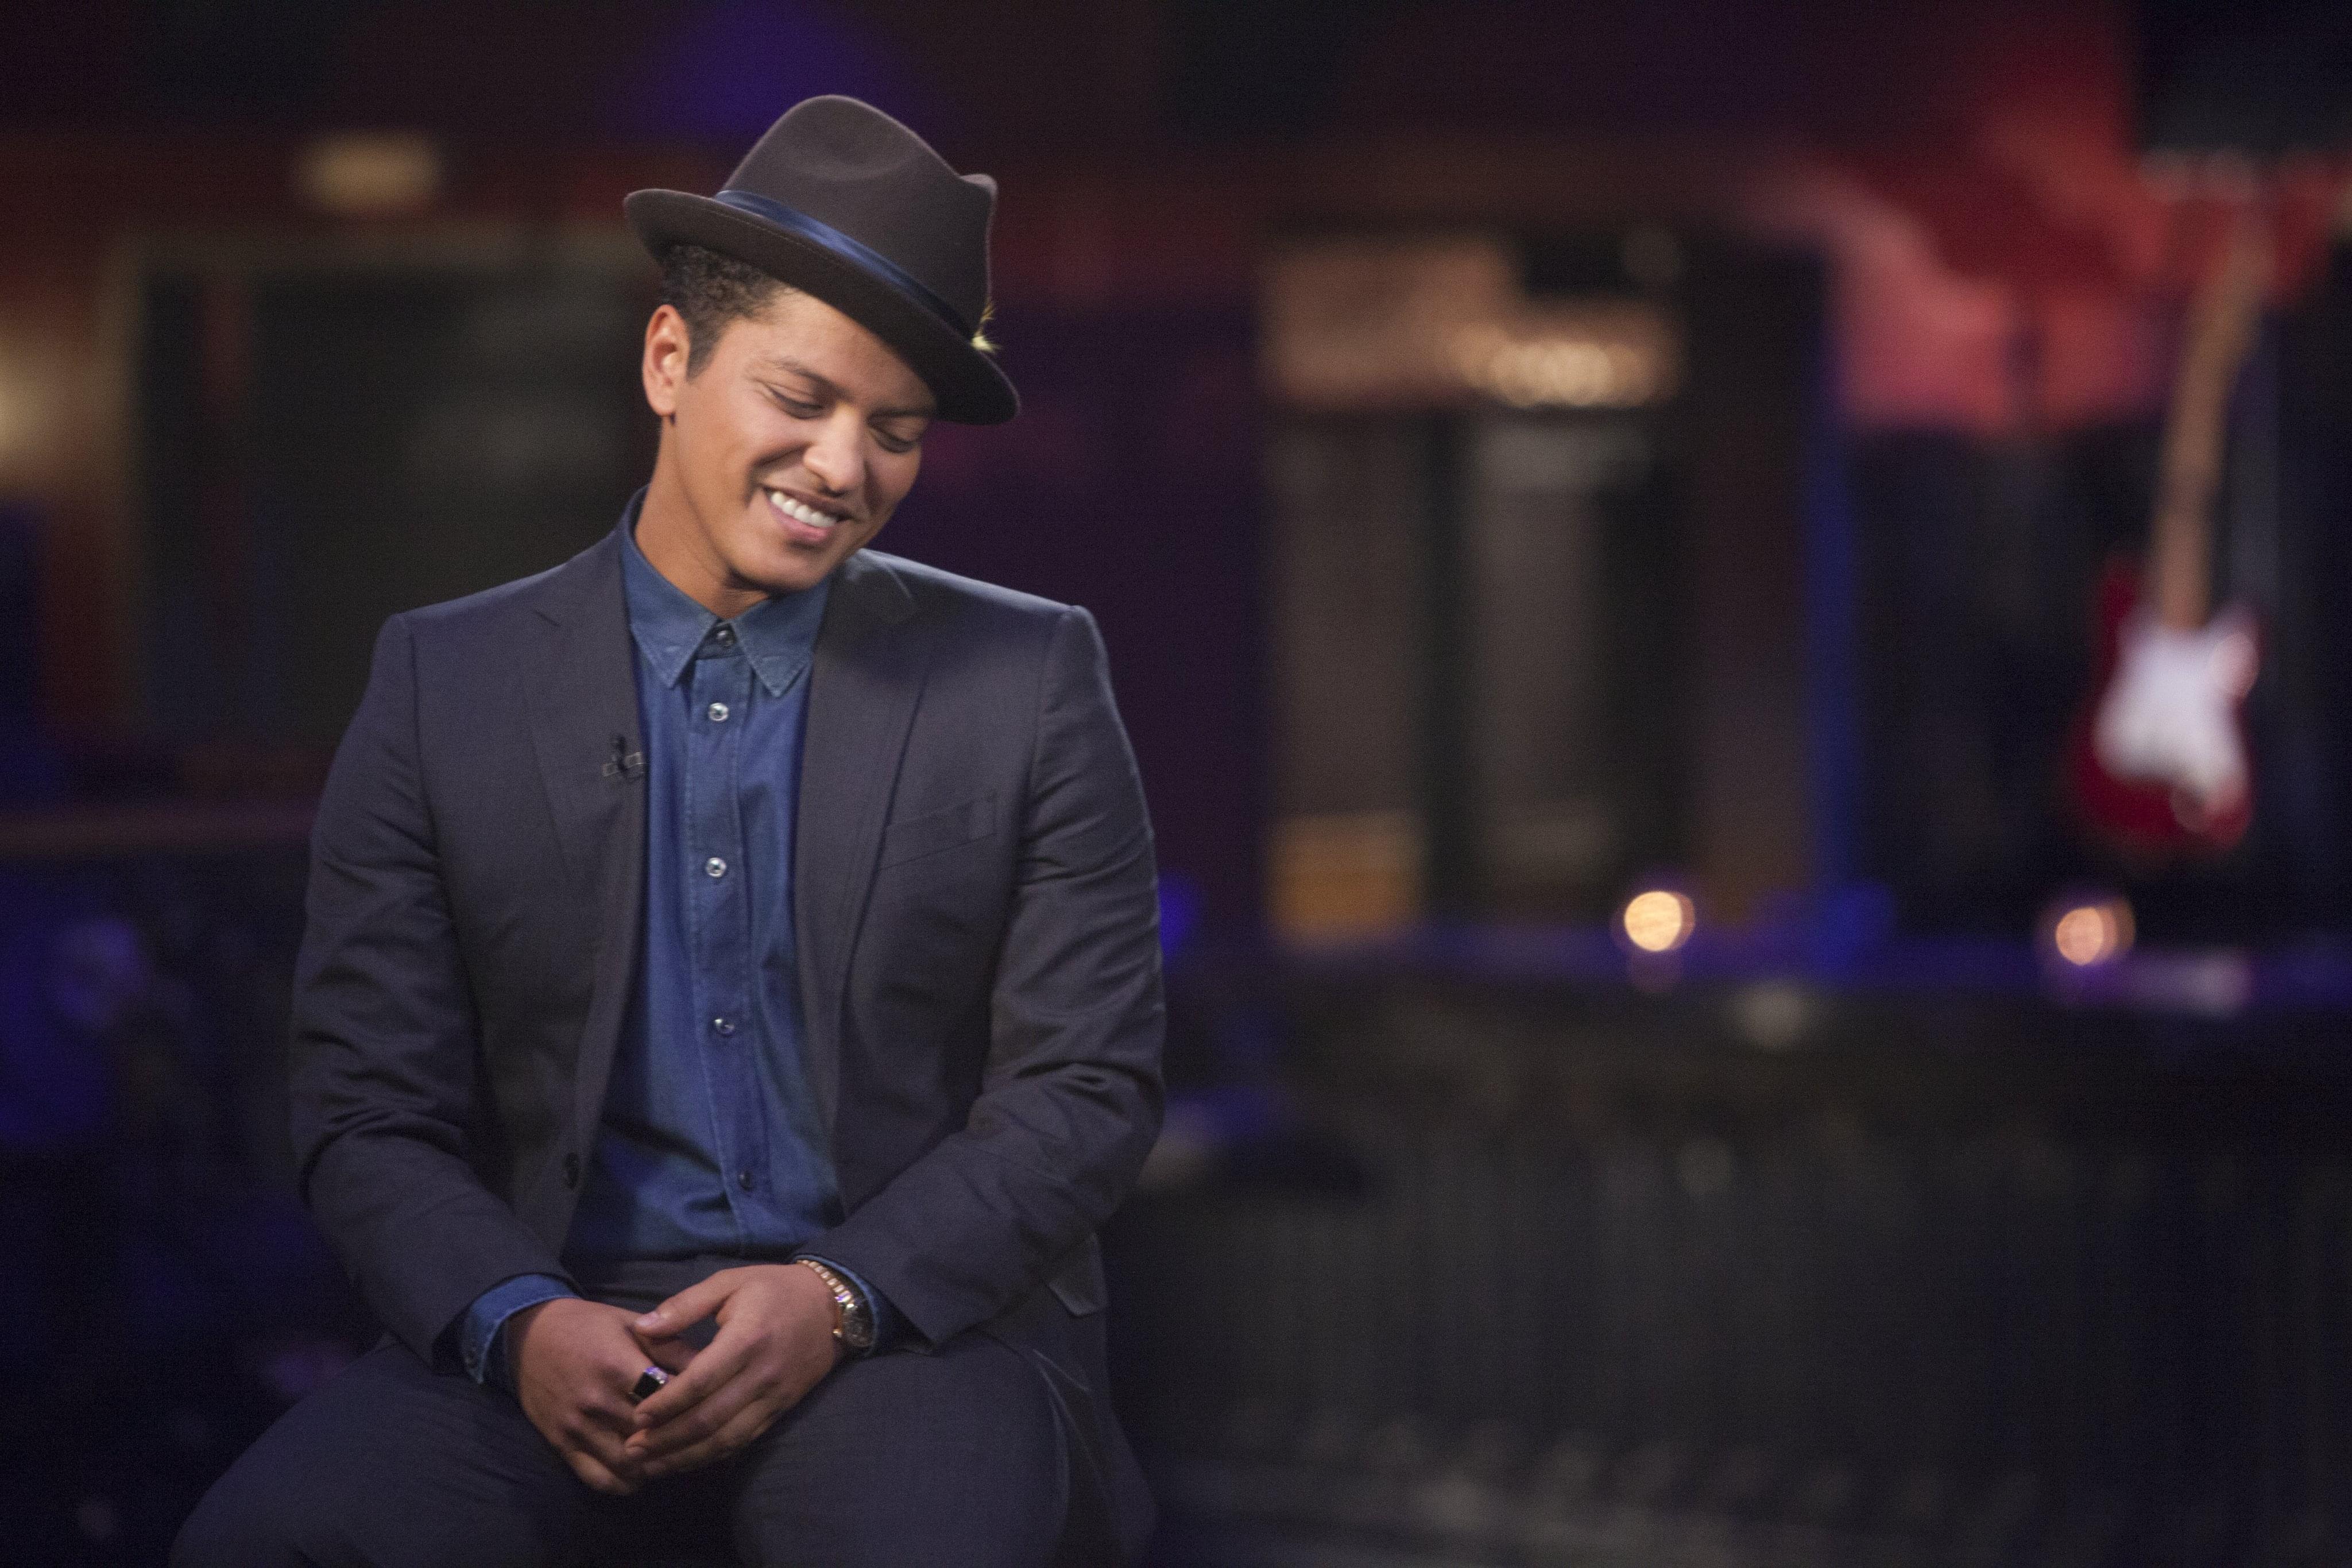 Bruno Mars Celebrates His Birthday With Ed Sheeran